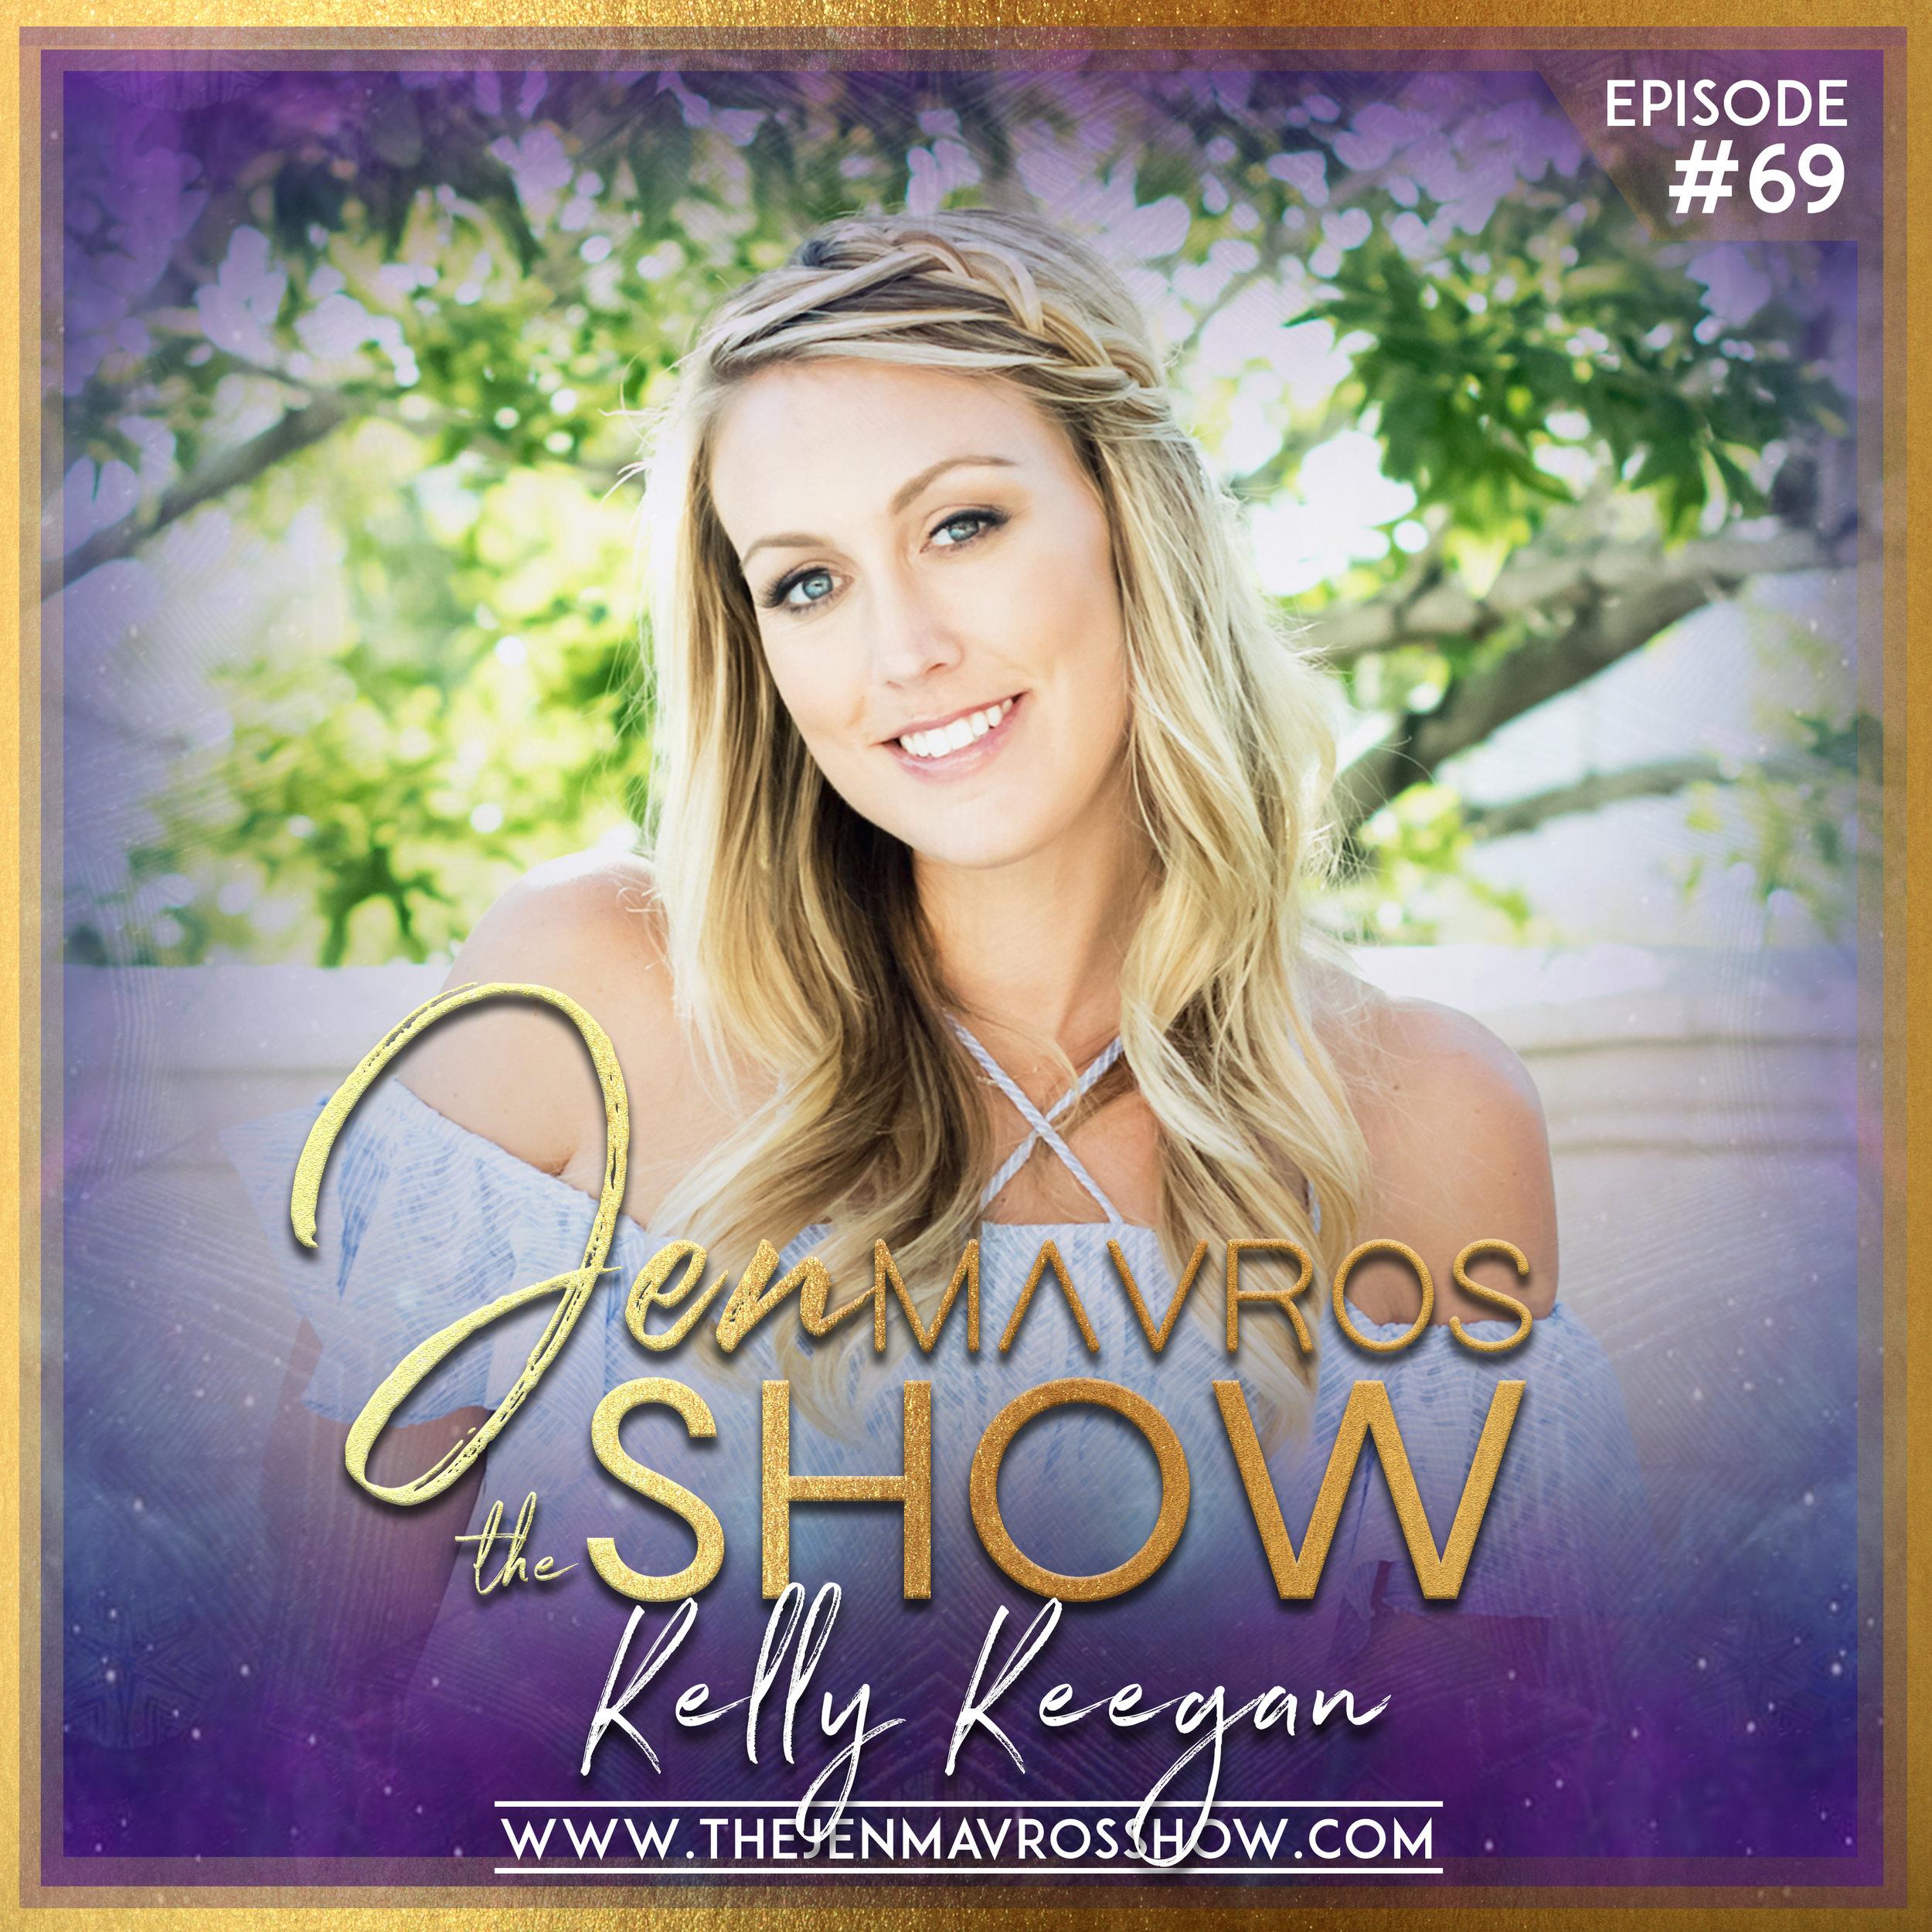 Kelly Keegan - The Enneagram - Understanding Ourselves & Others